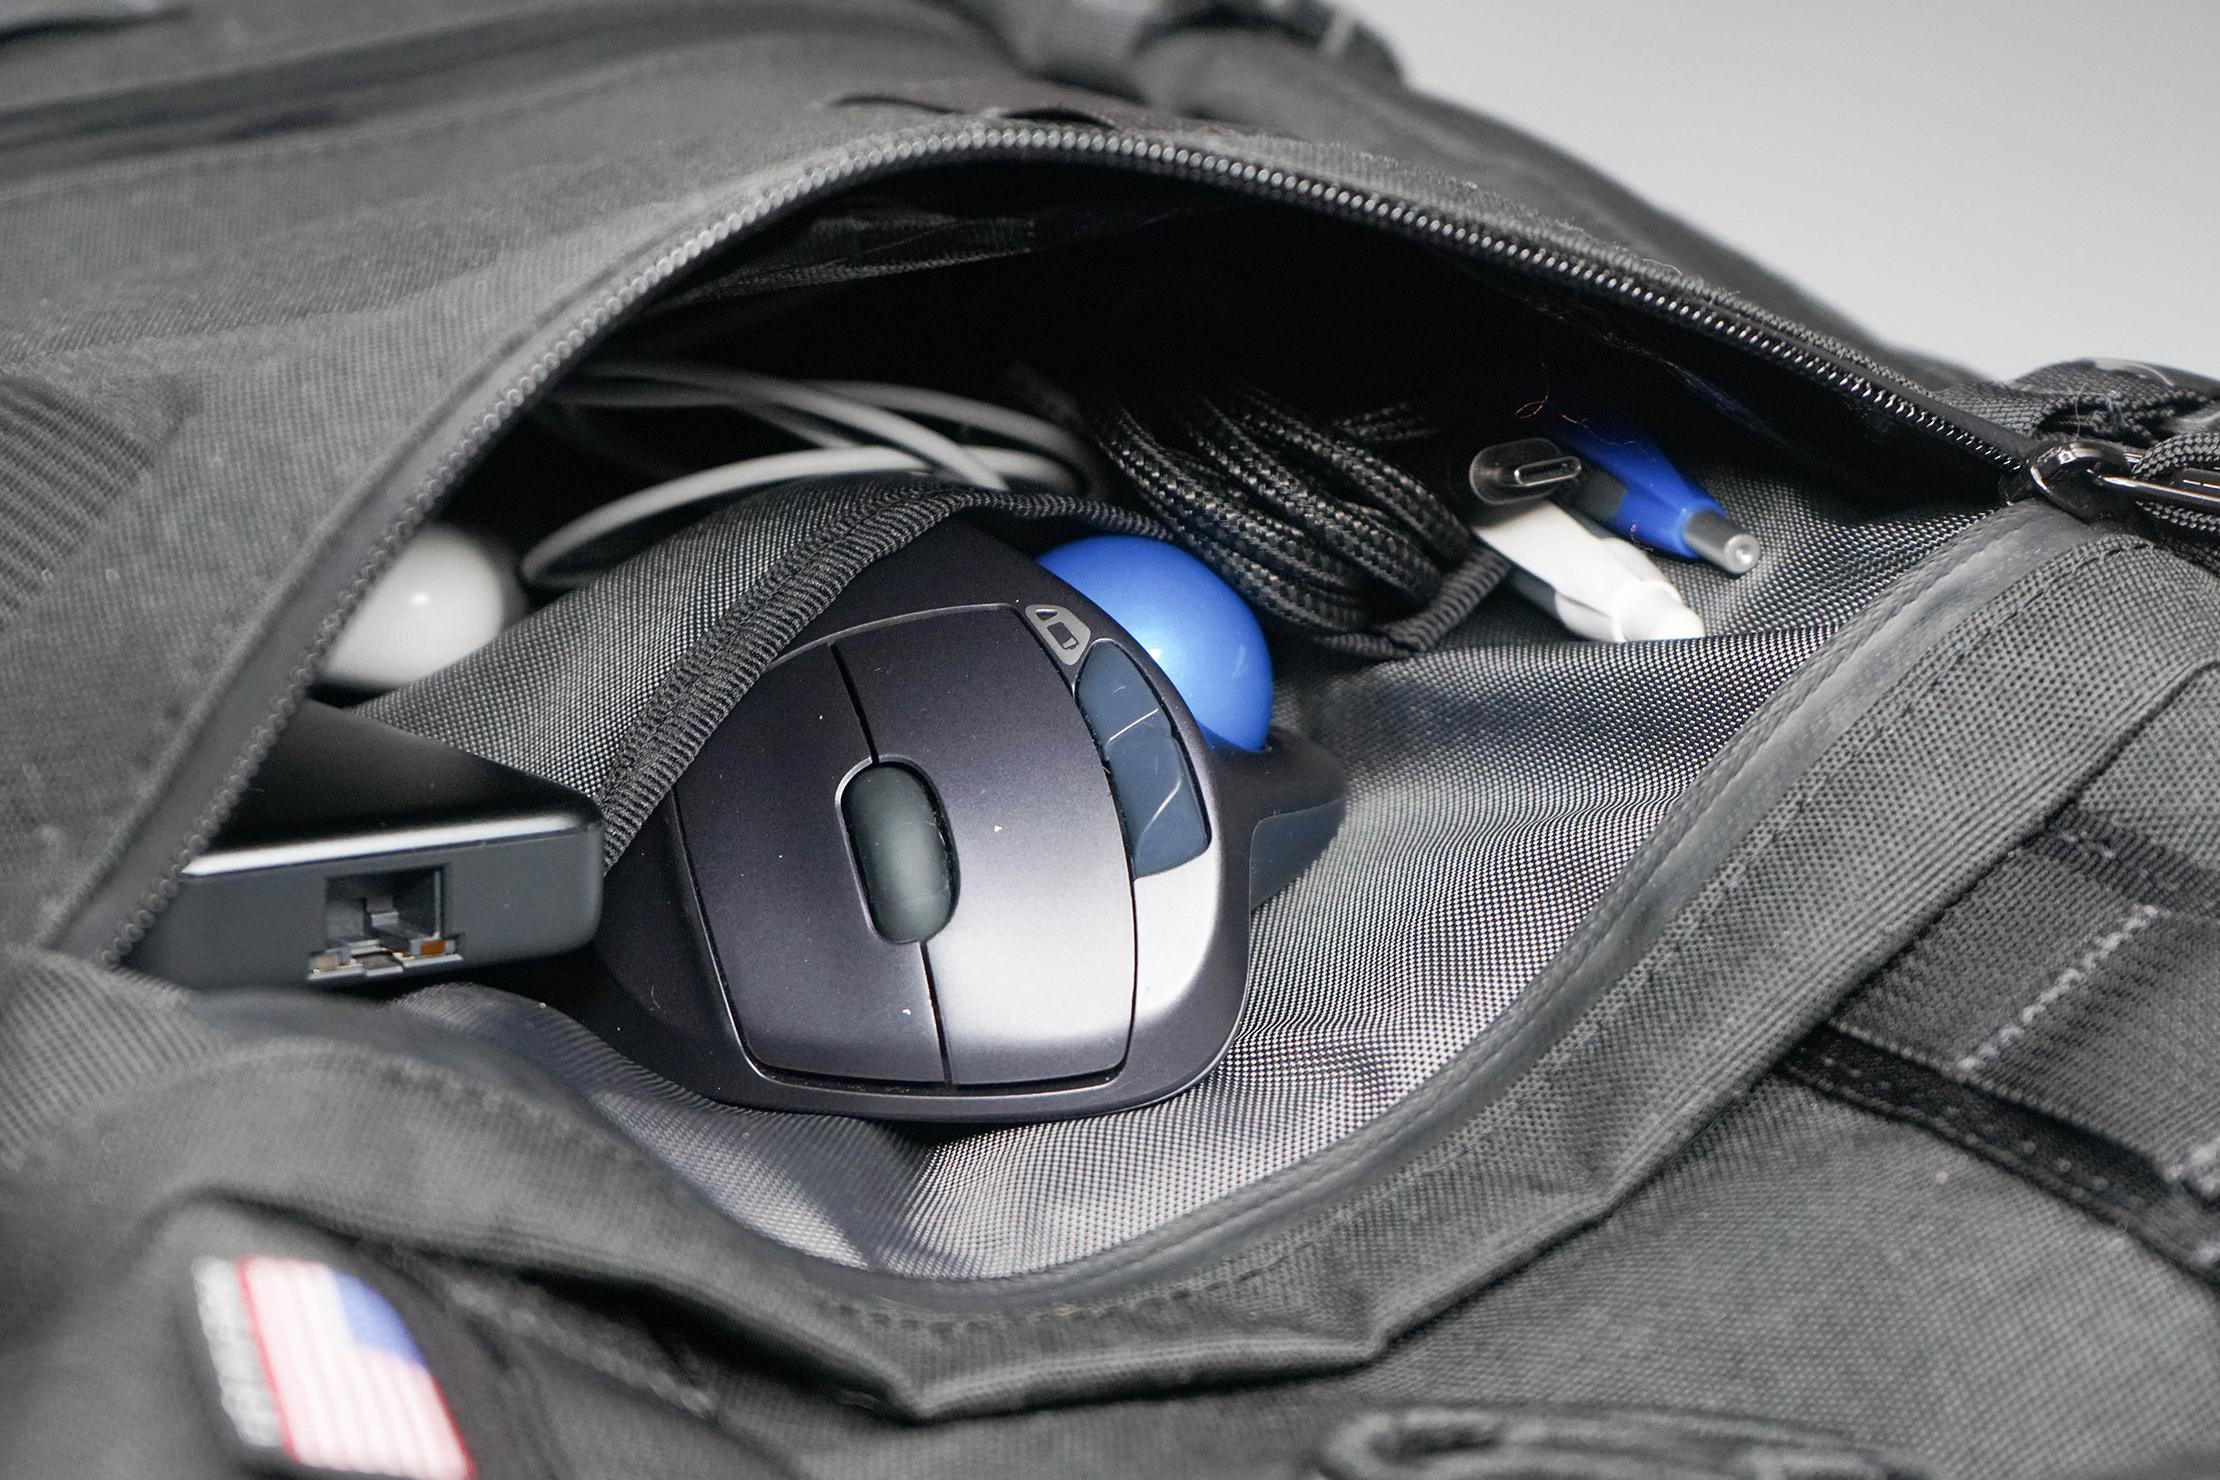 North St. Bags Weekender Backpack Middle Pocket